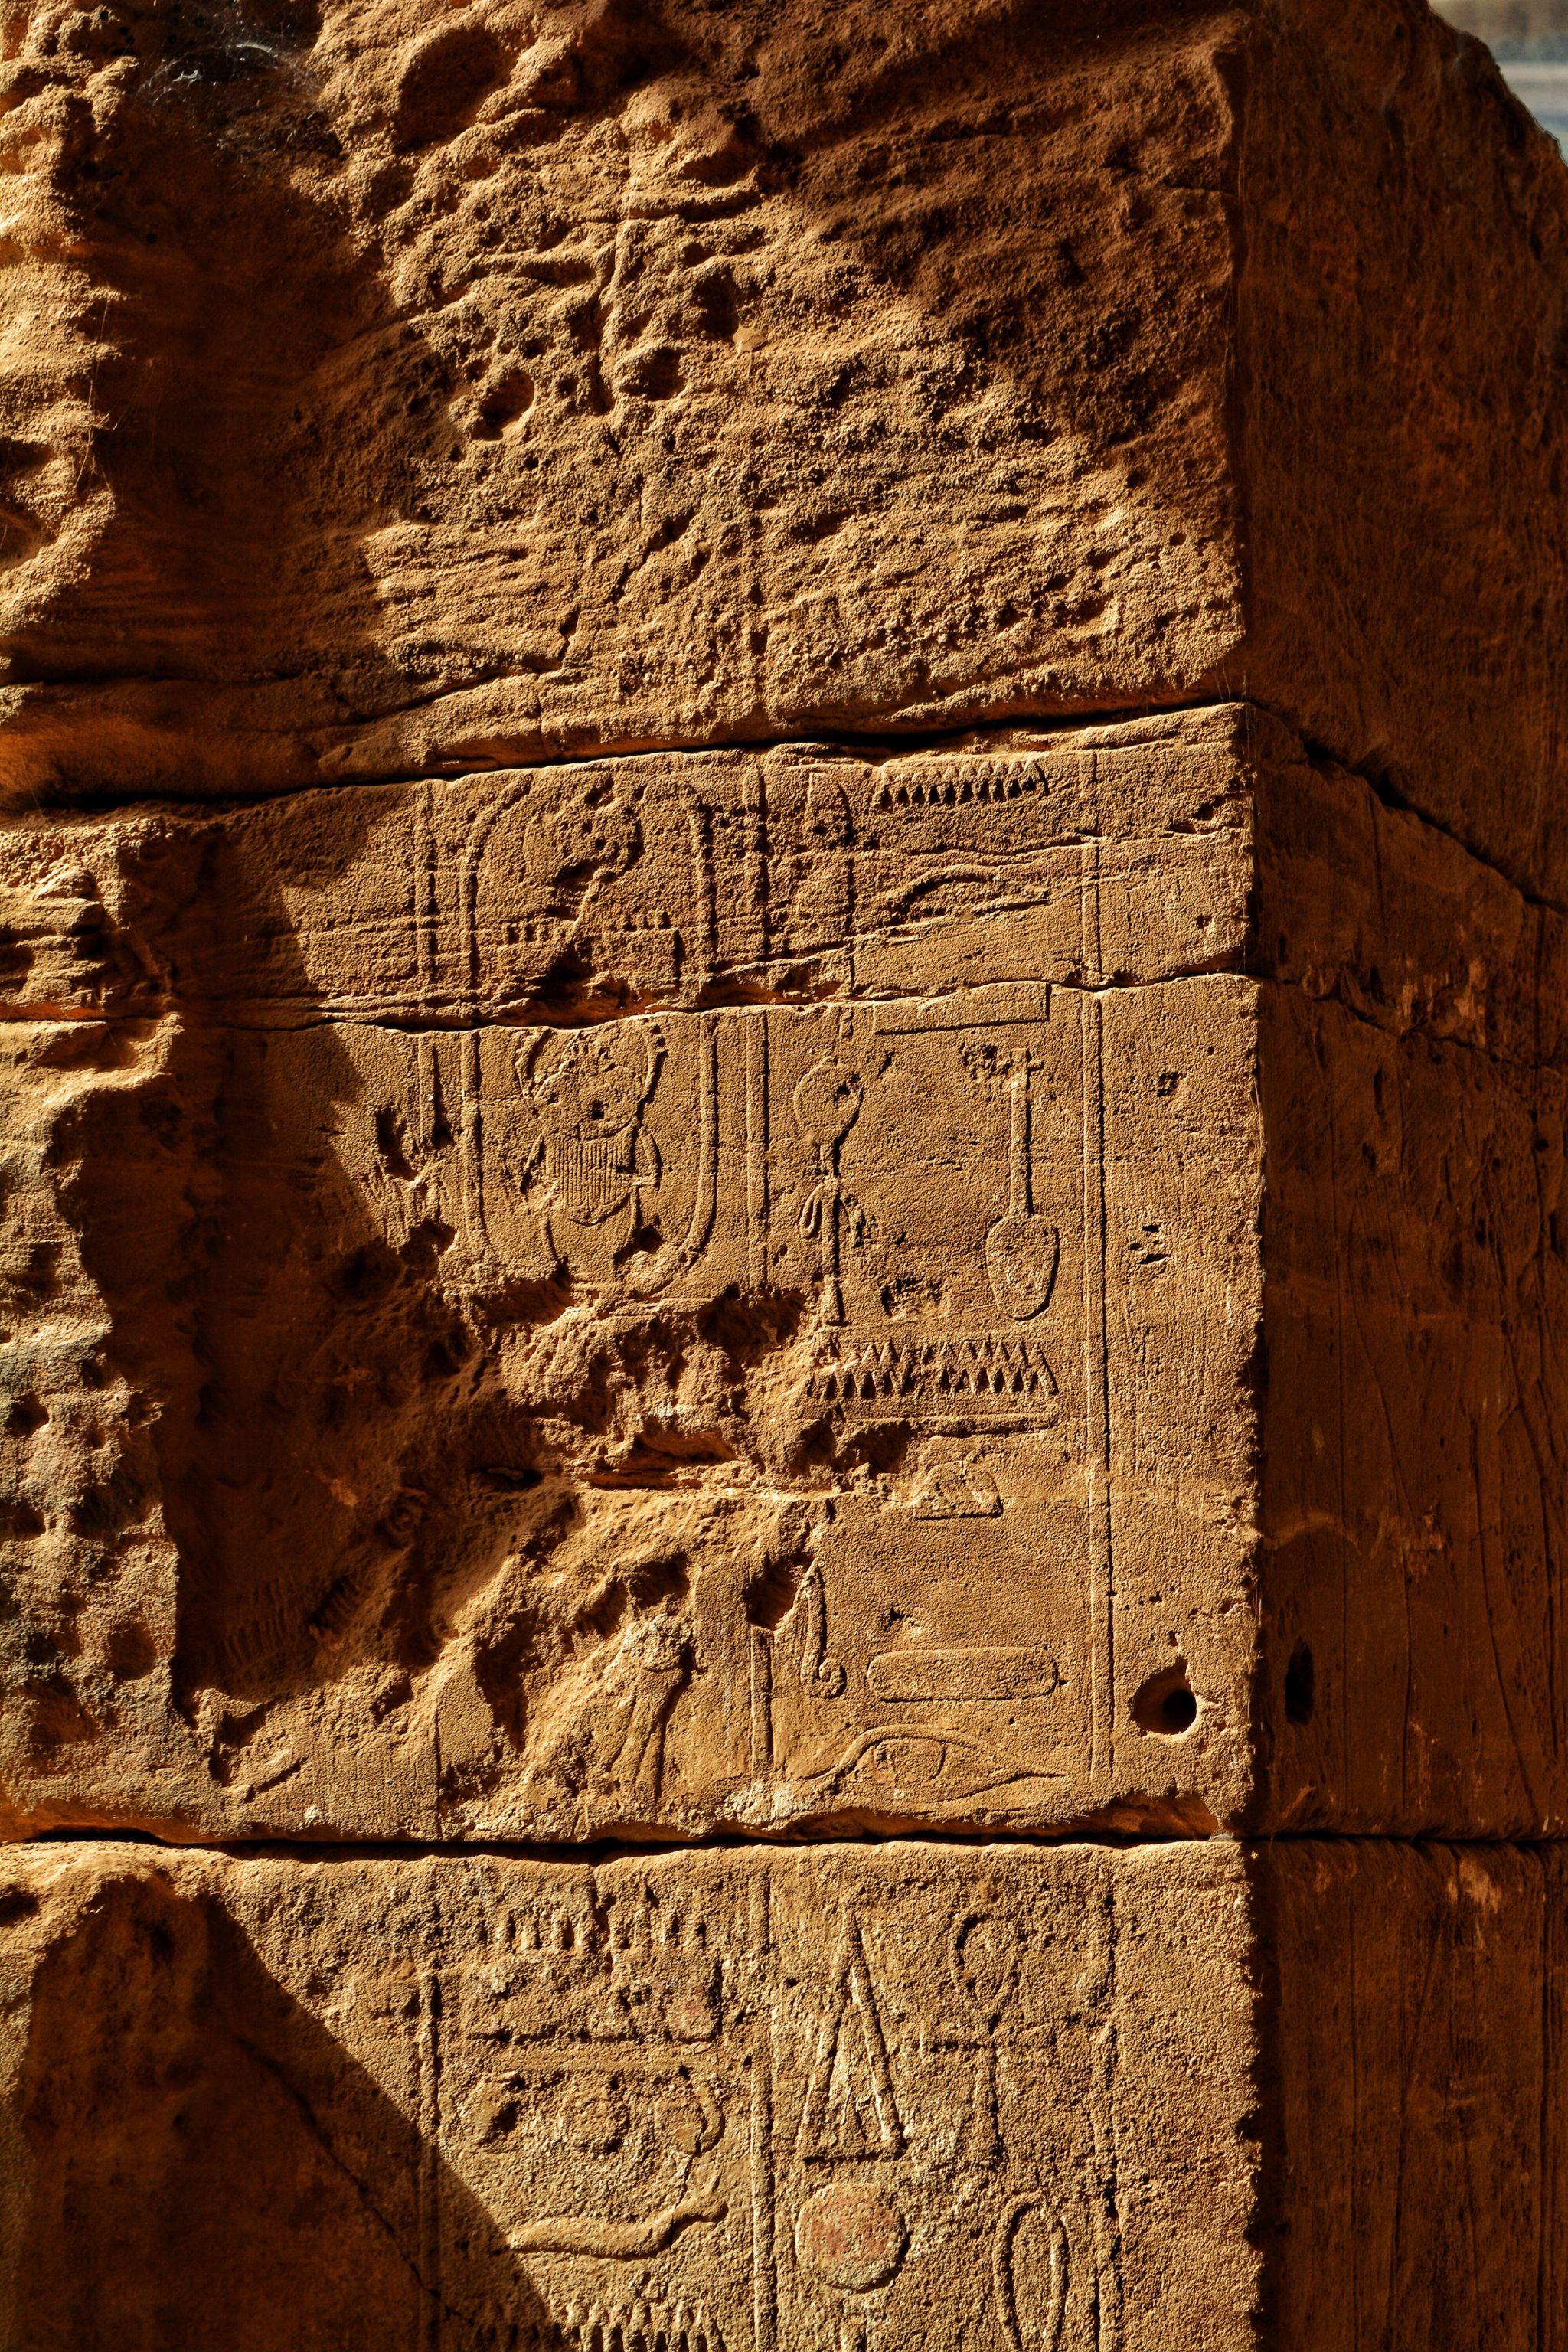 Hieroglyphics, Sudan Museum, Khartoum